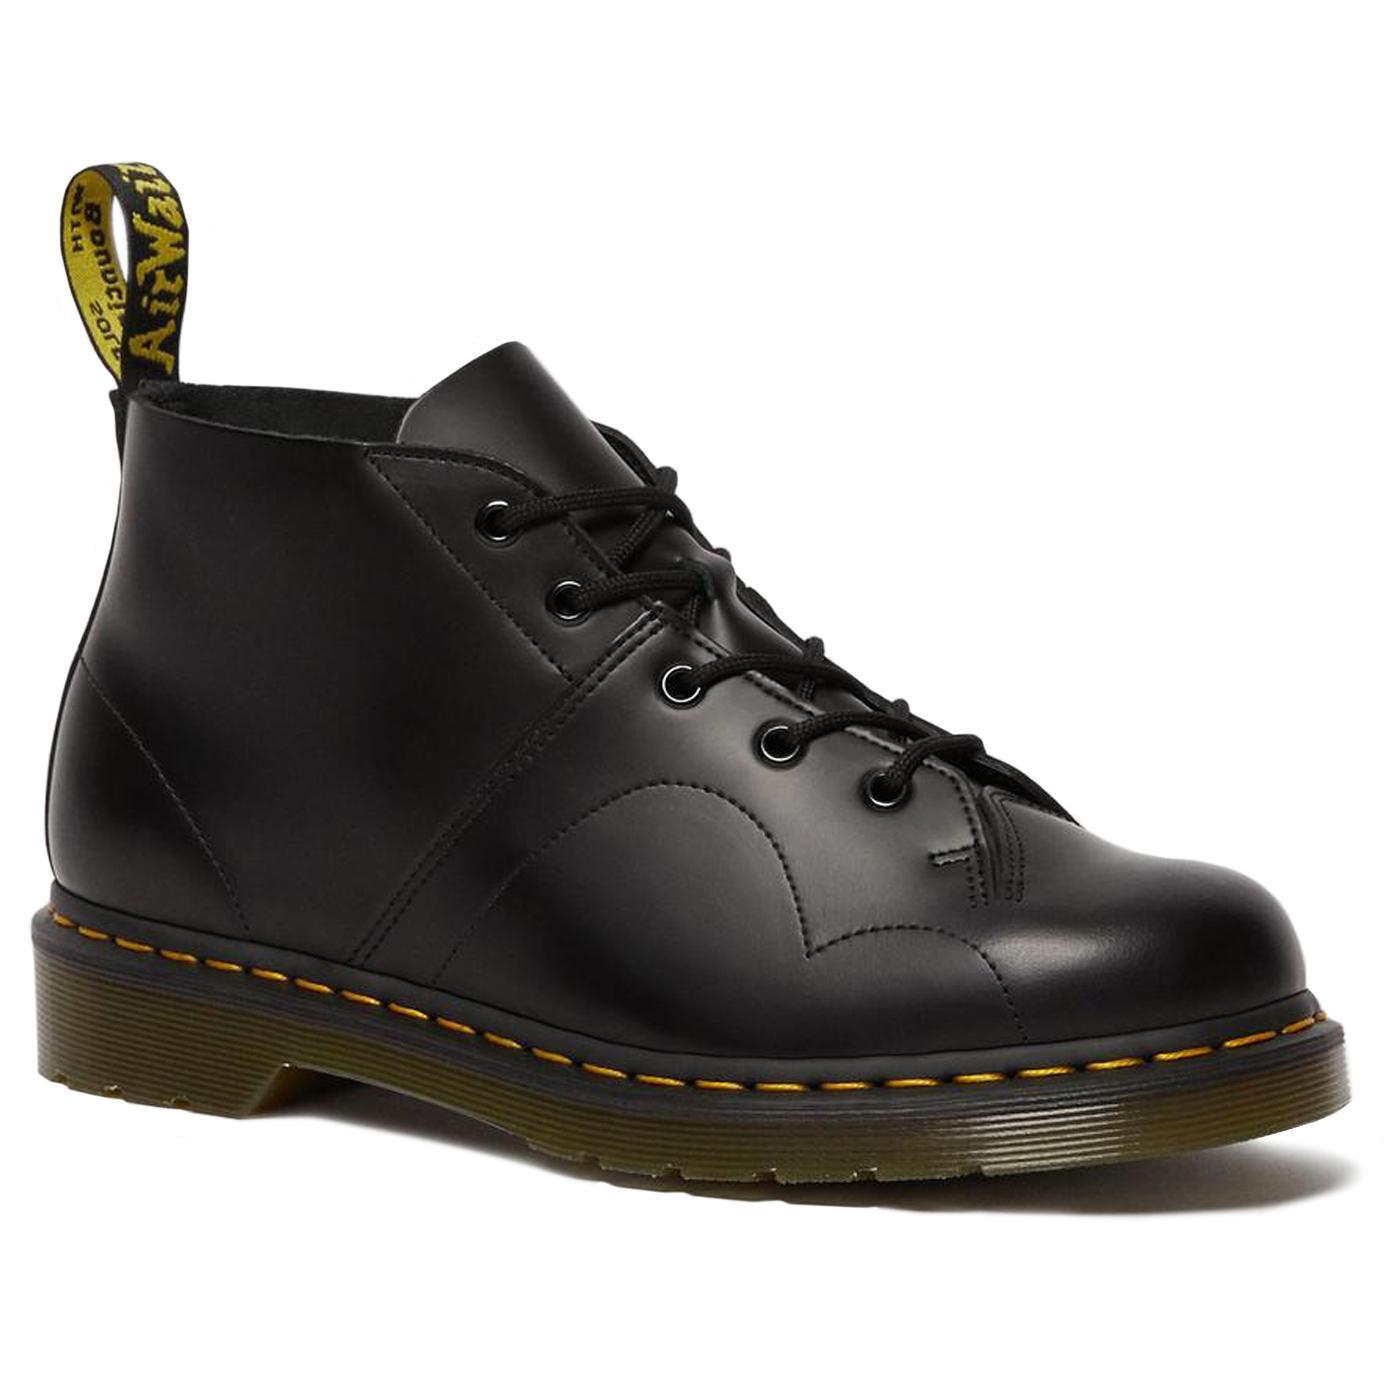 Church DR MARTENS Men's Retro Monkey Boots BLACK